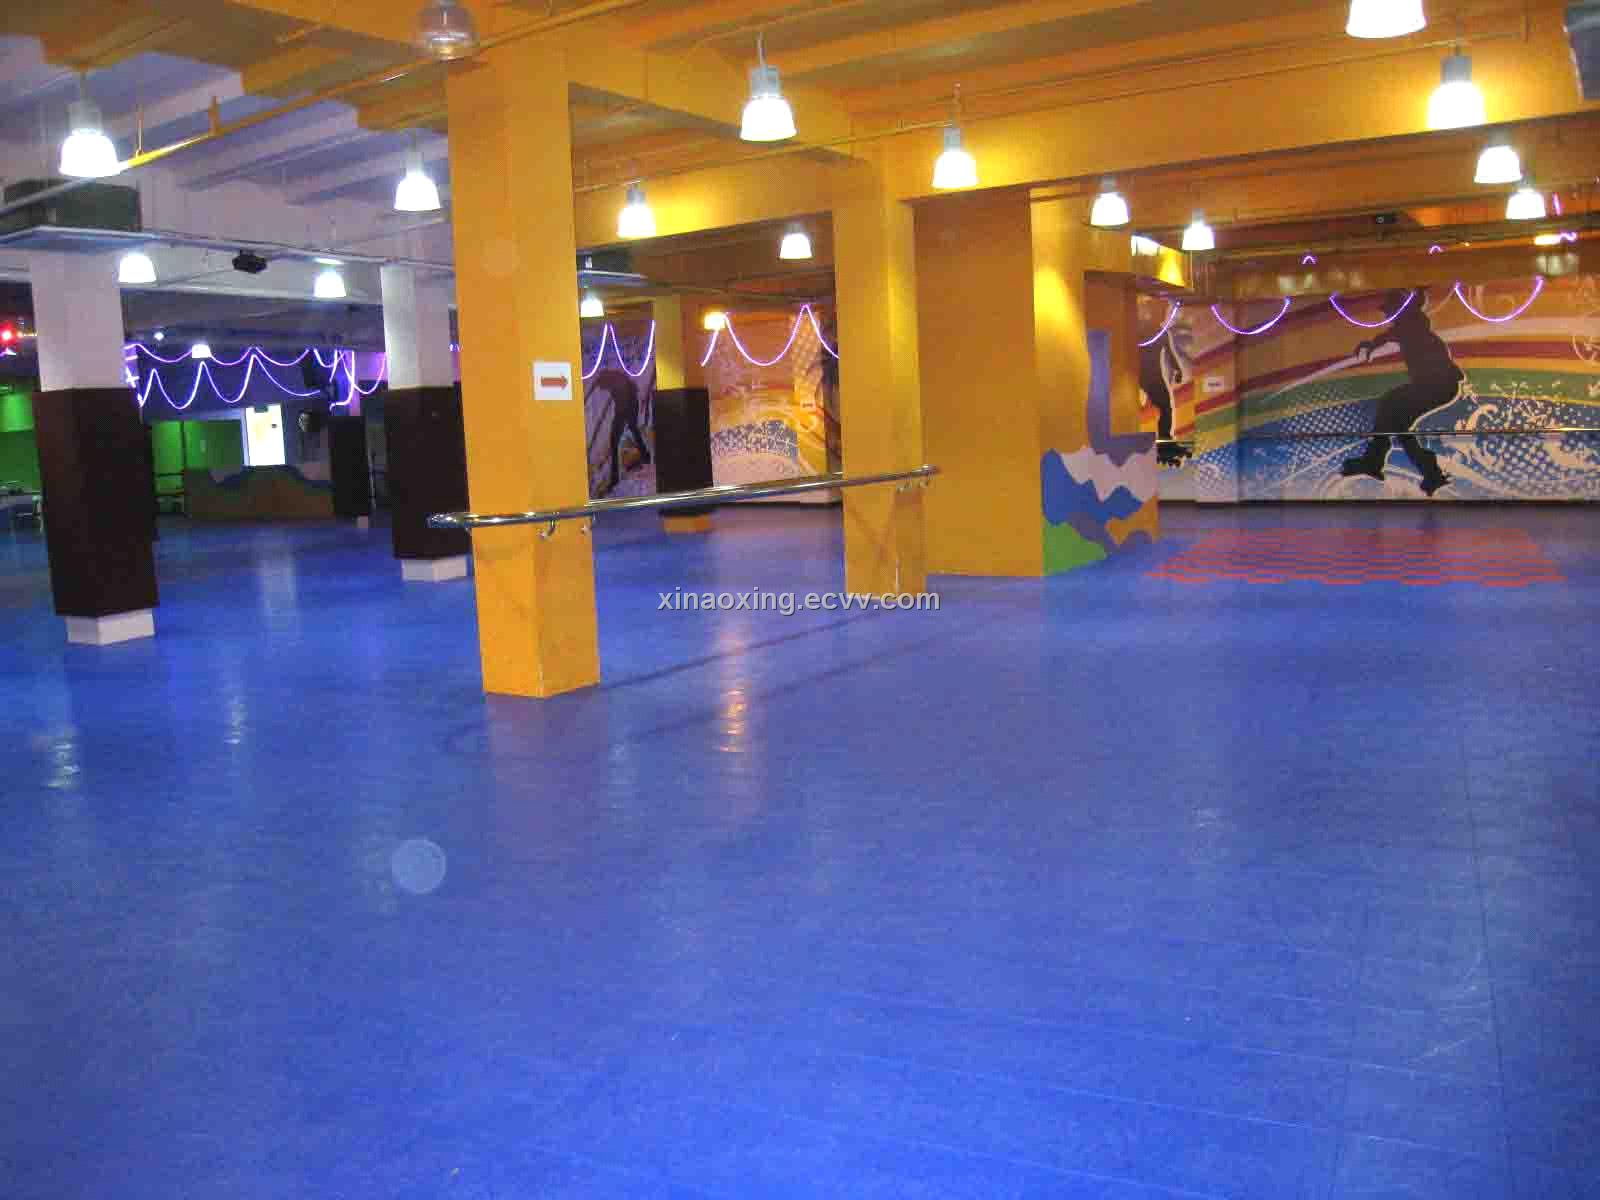 SUGE Interlocking Roller Skating Rink Flooring T Purchasing Souring - Roller skating rink flooring for sale